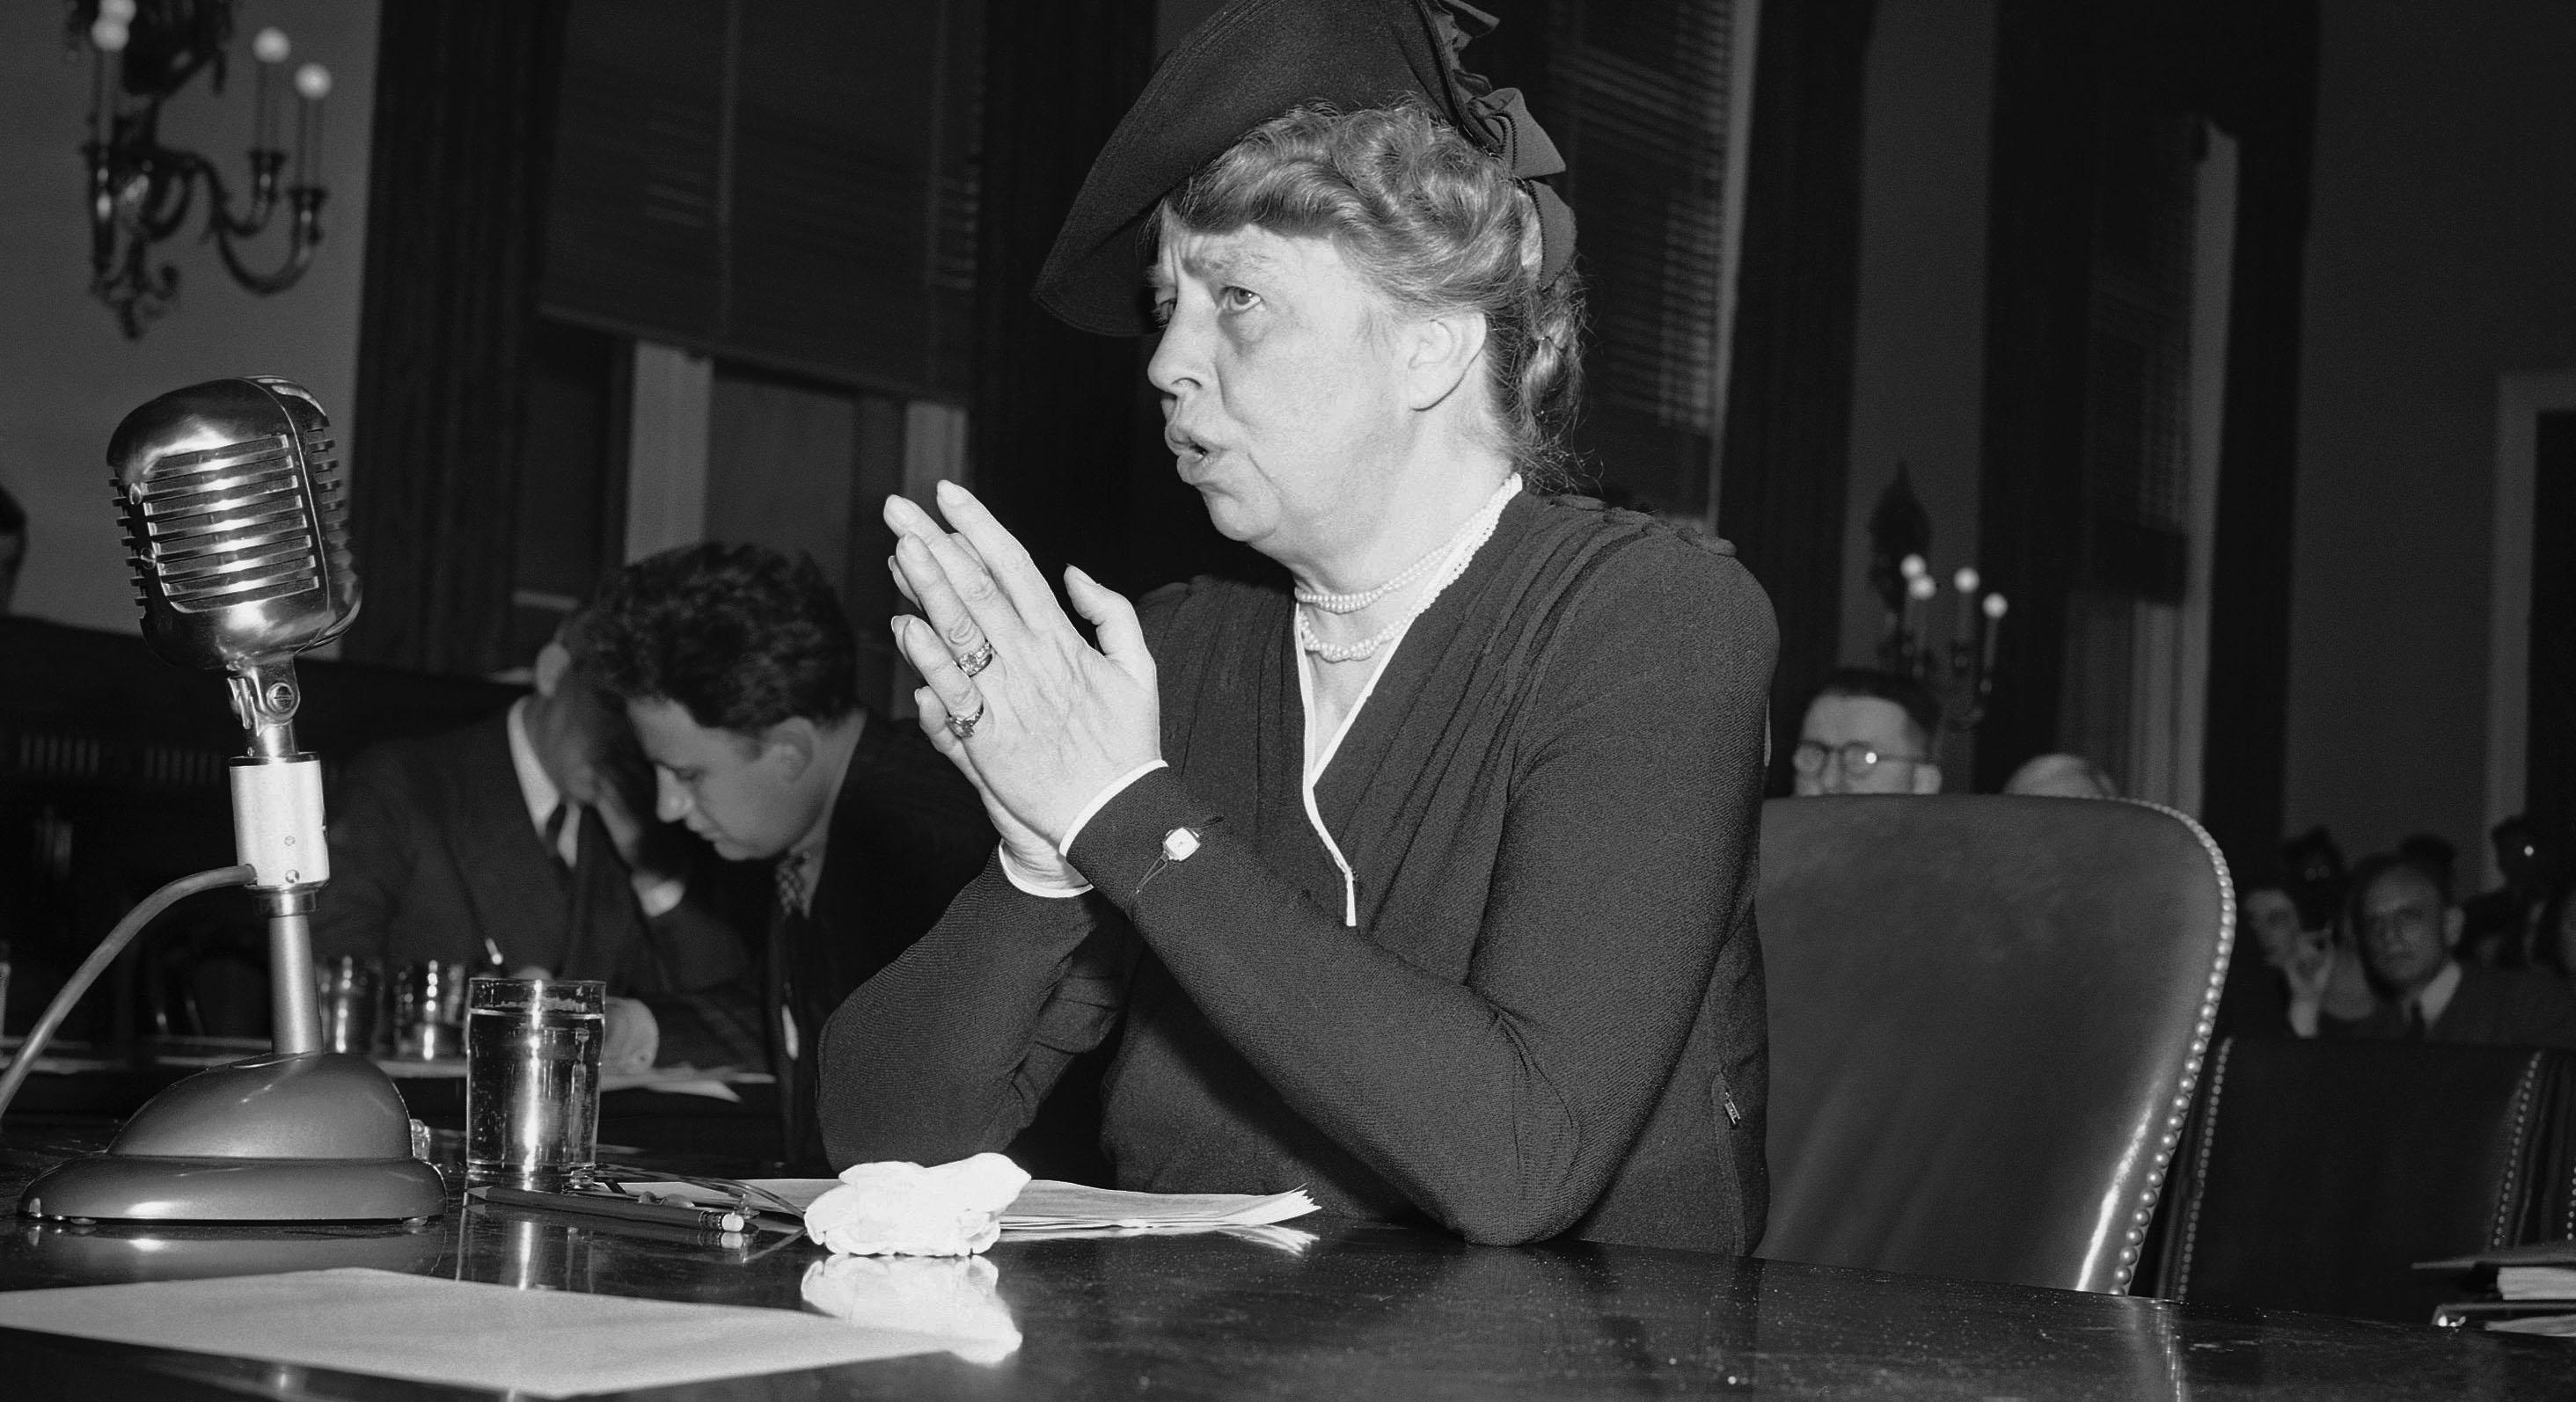 Eleanor Roosevelt born in New York City Oct 11 1884